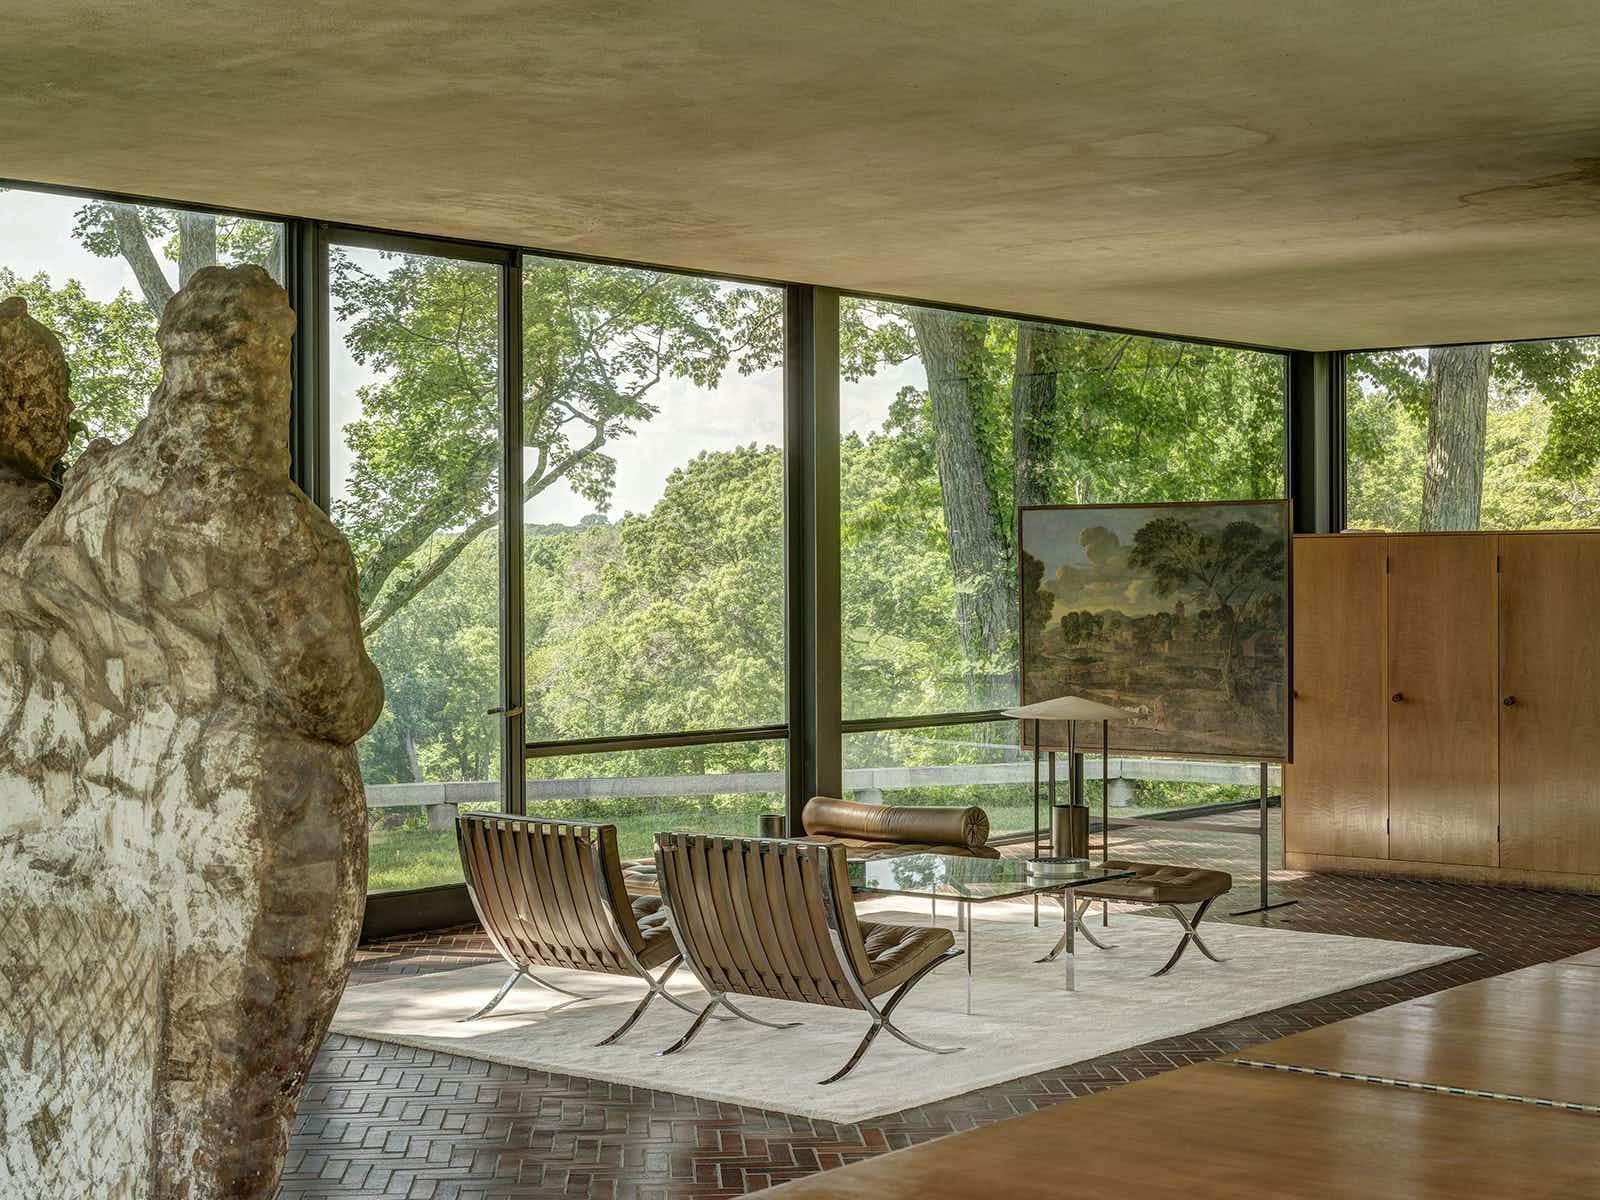 Seeking mid-century modern design in the Eastern USA